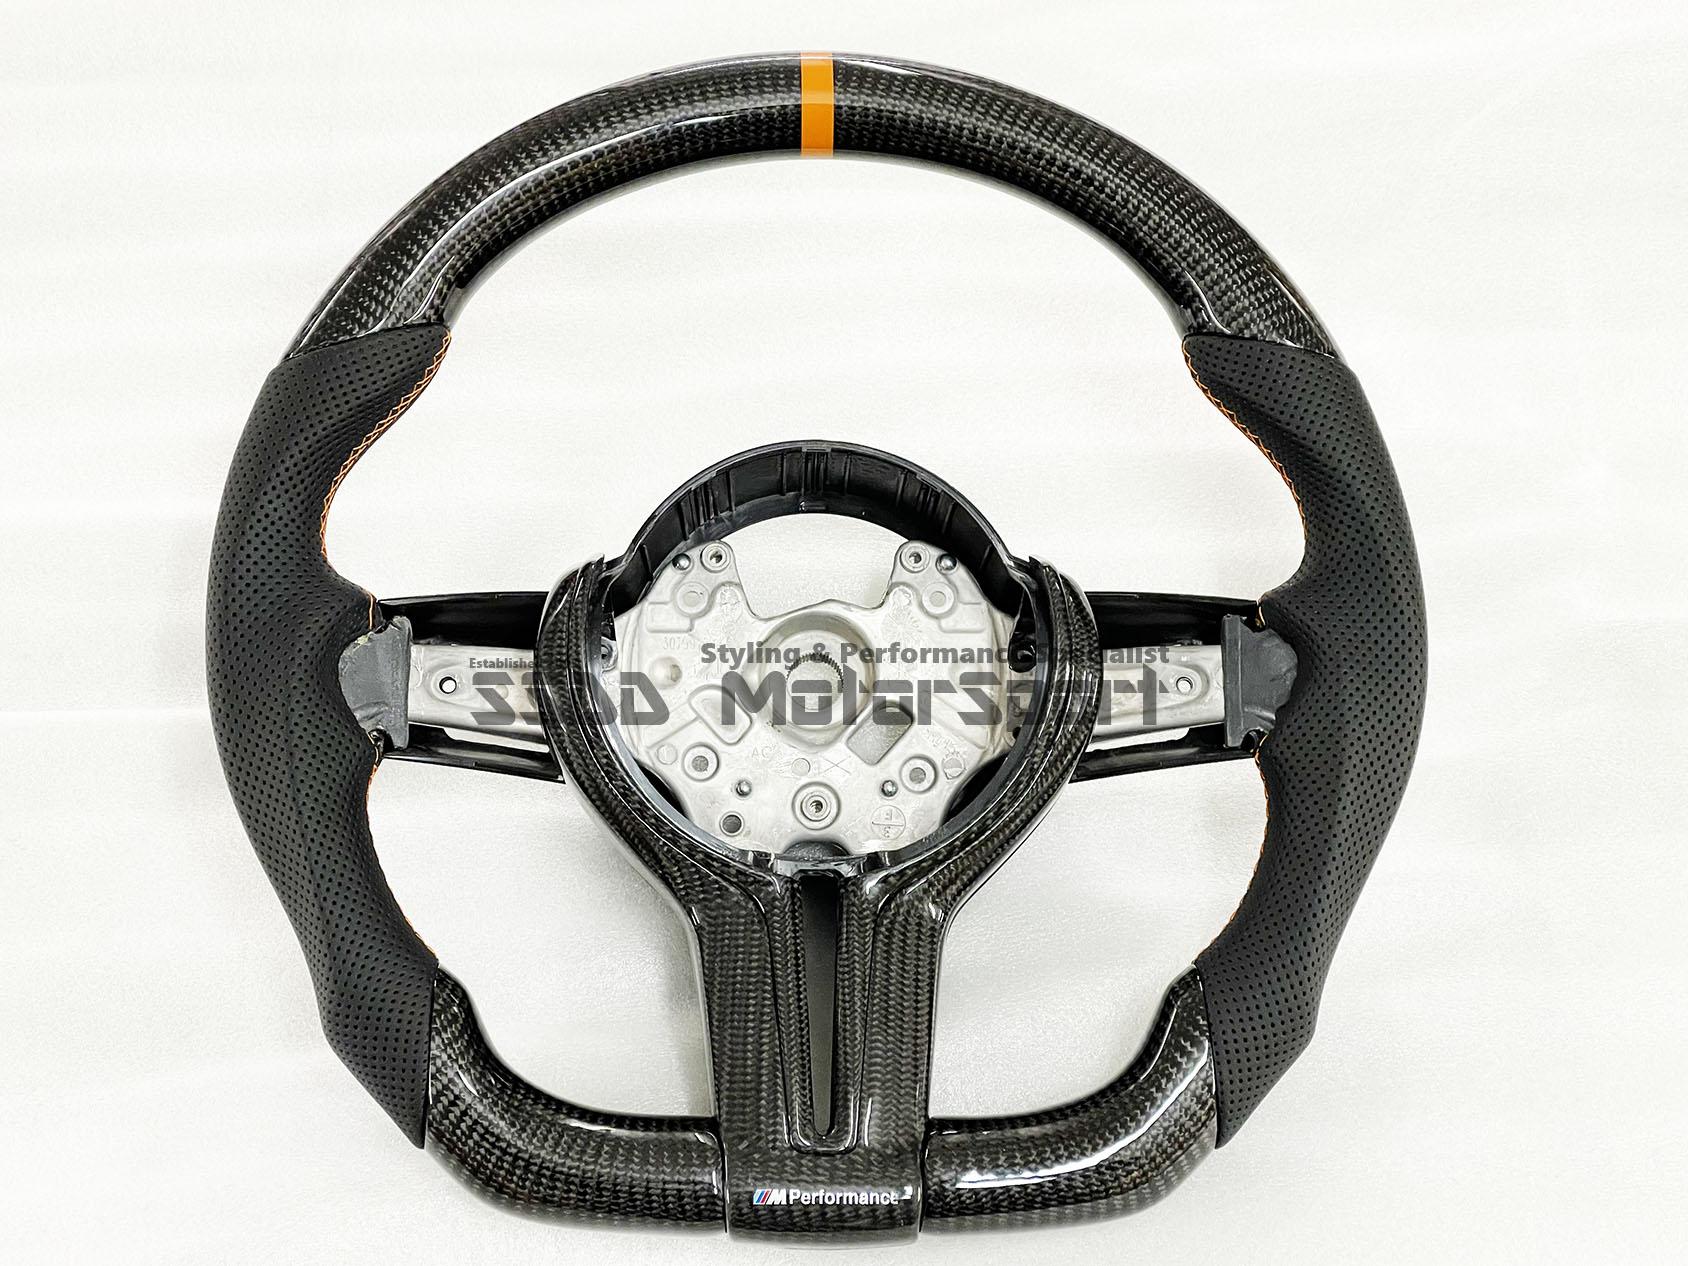 bmw-f20-f30-f32-performance-carbon-flat-bottom-steering-wheel-orange-stitching-with-carbon-trim-copy.jpg